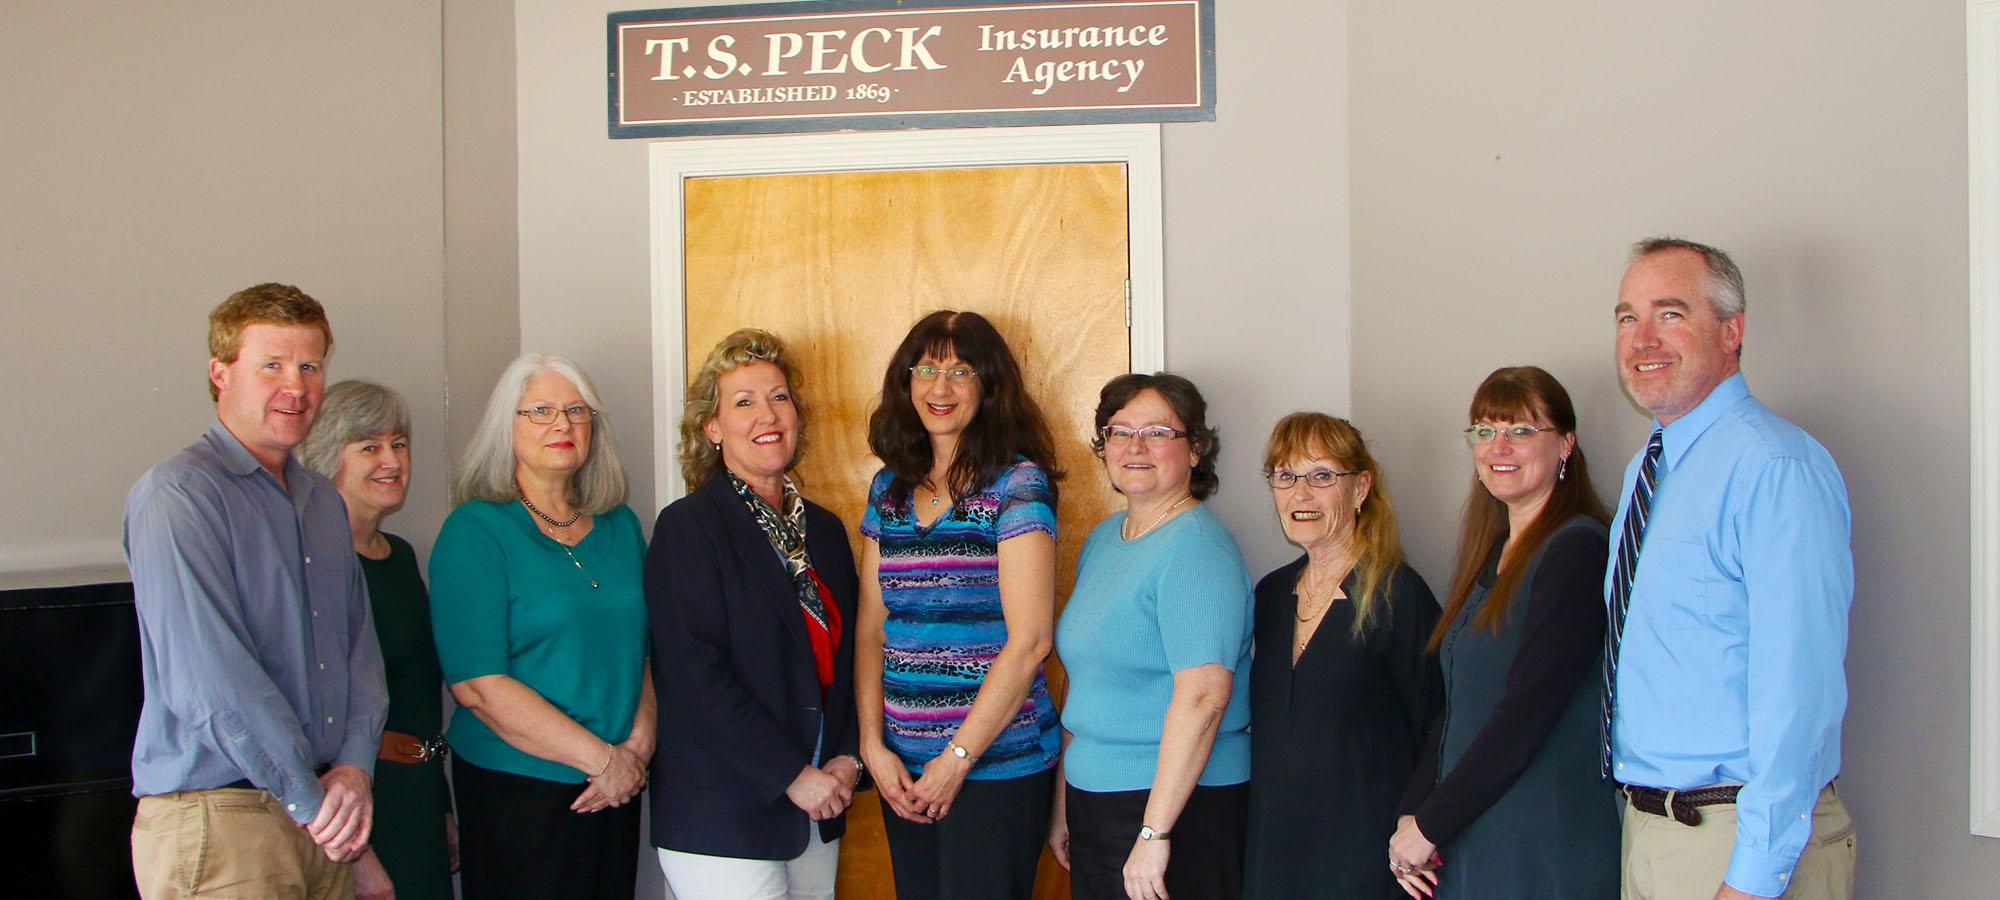 T.S. Peck Insurance Team